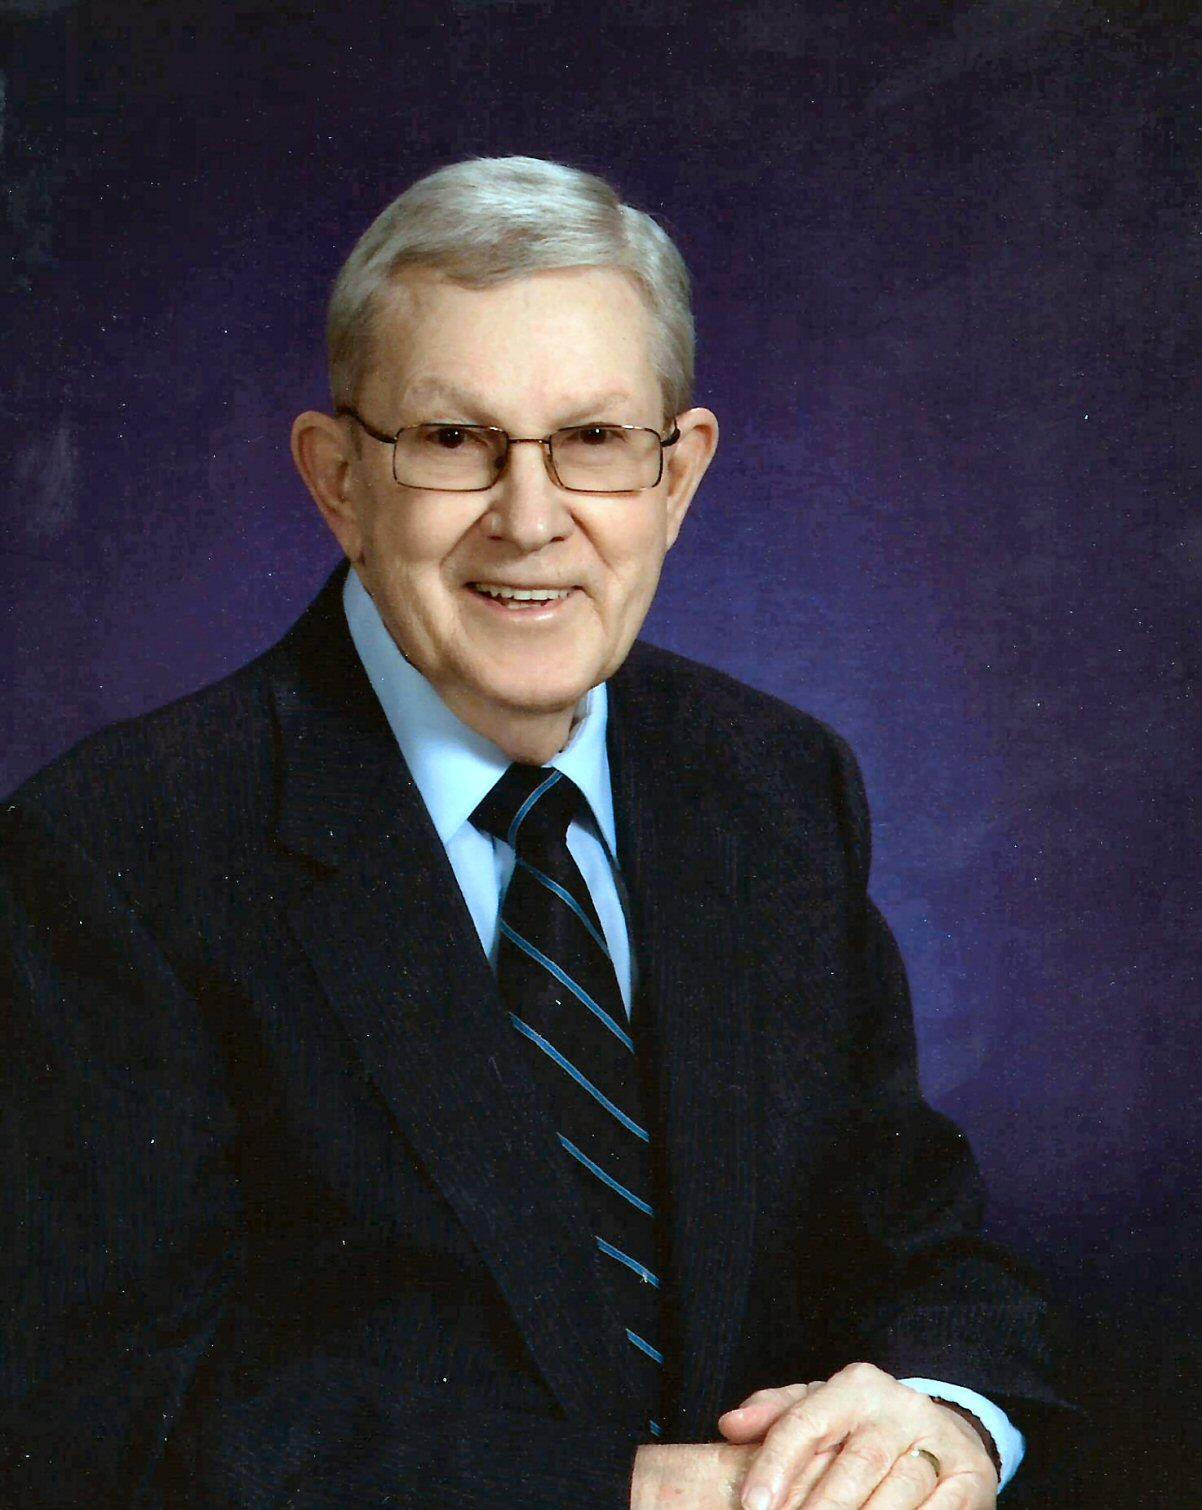 Michael Thompson Net Worth